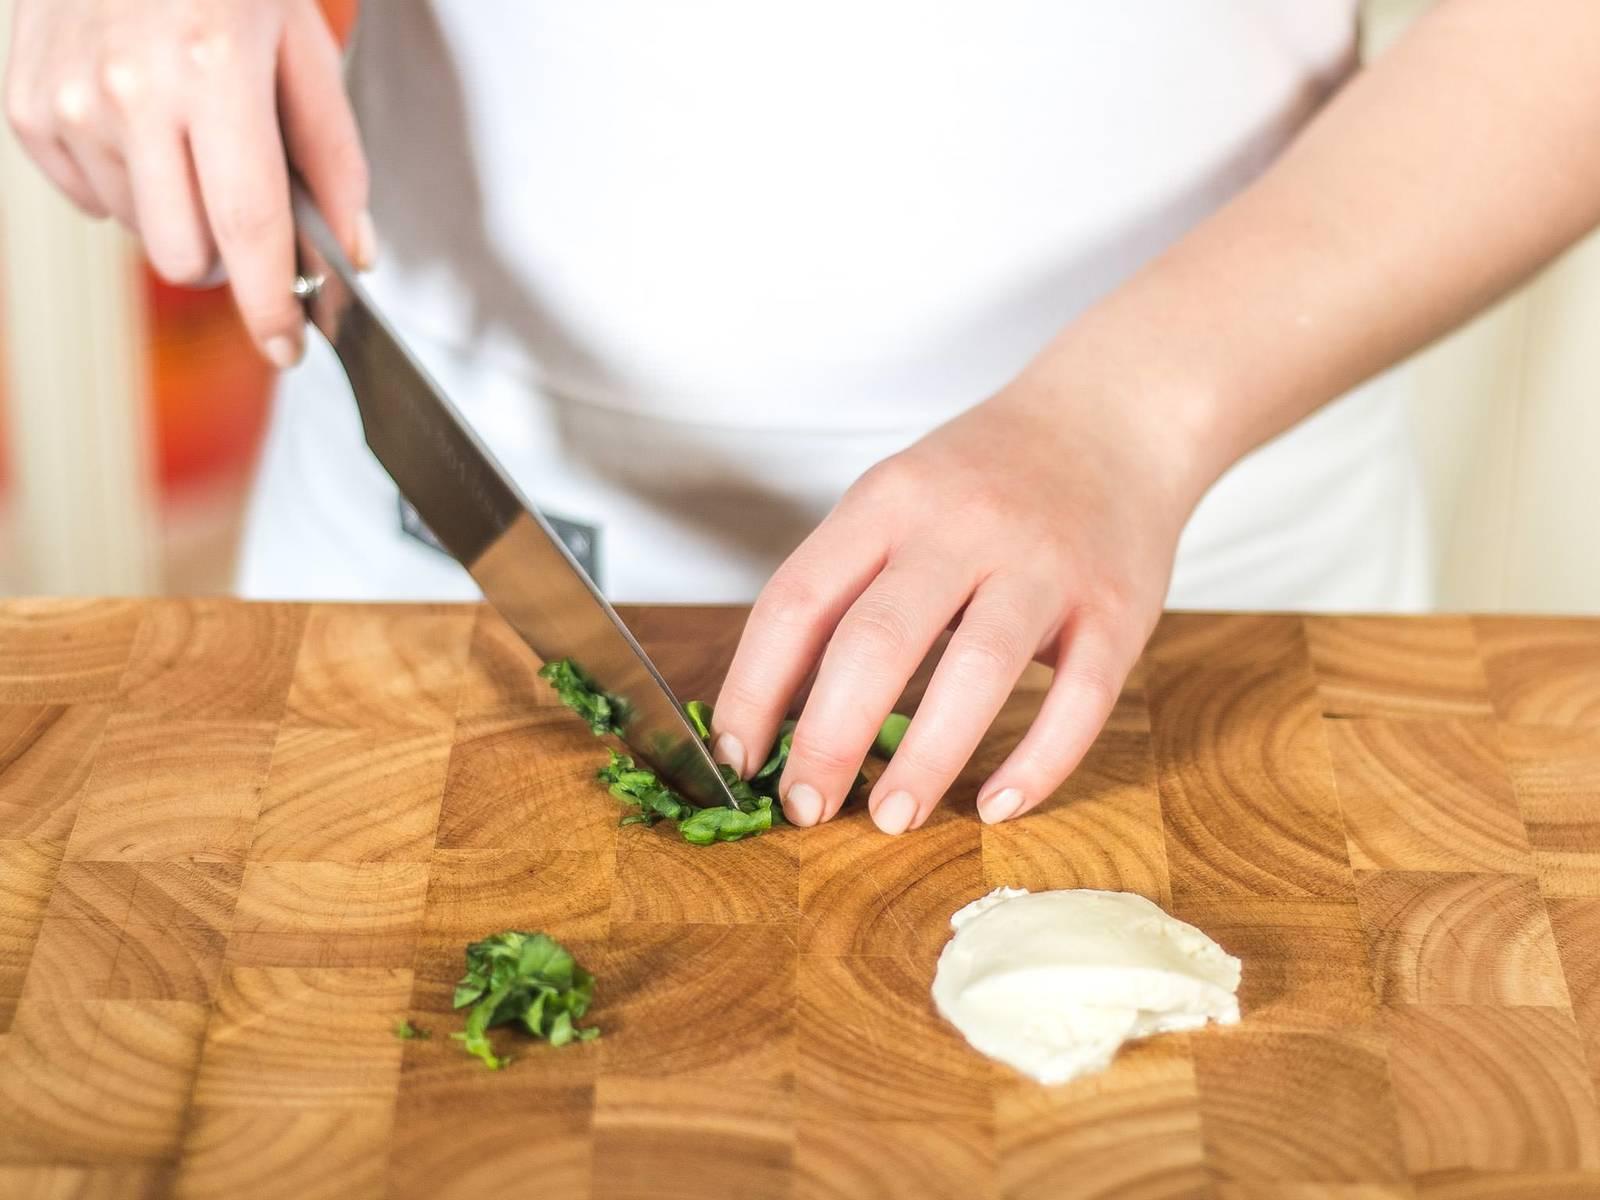 Preheat oven to 180°C/ 355°F. Cut mozzarella into thin slices, chop basil into thin strips.